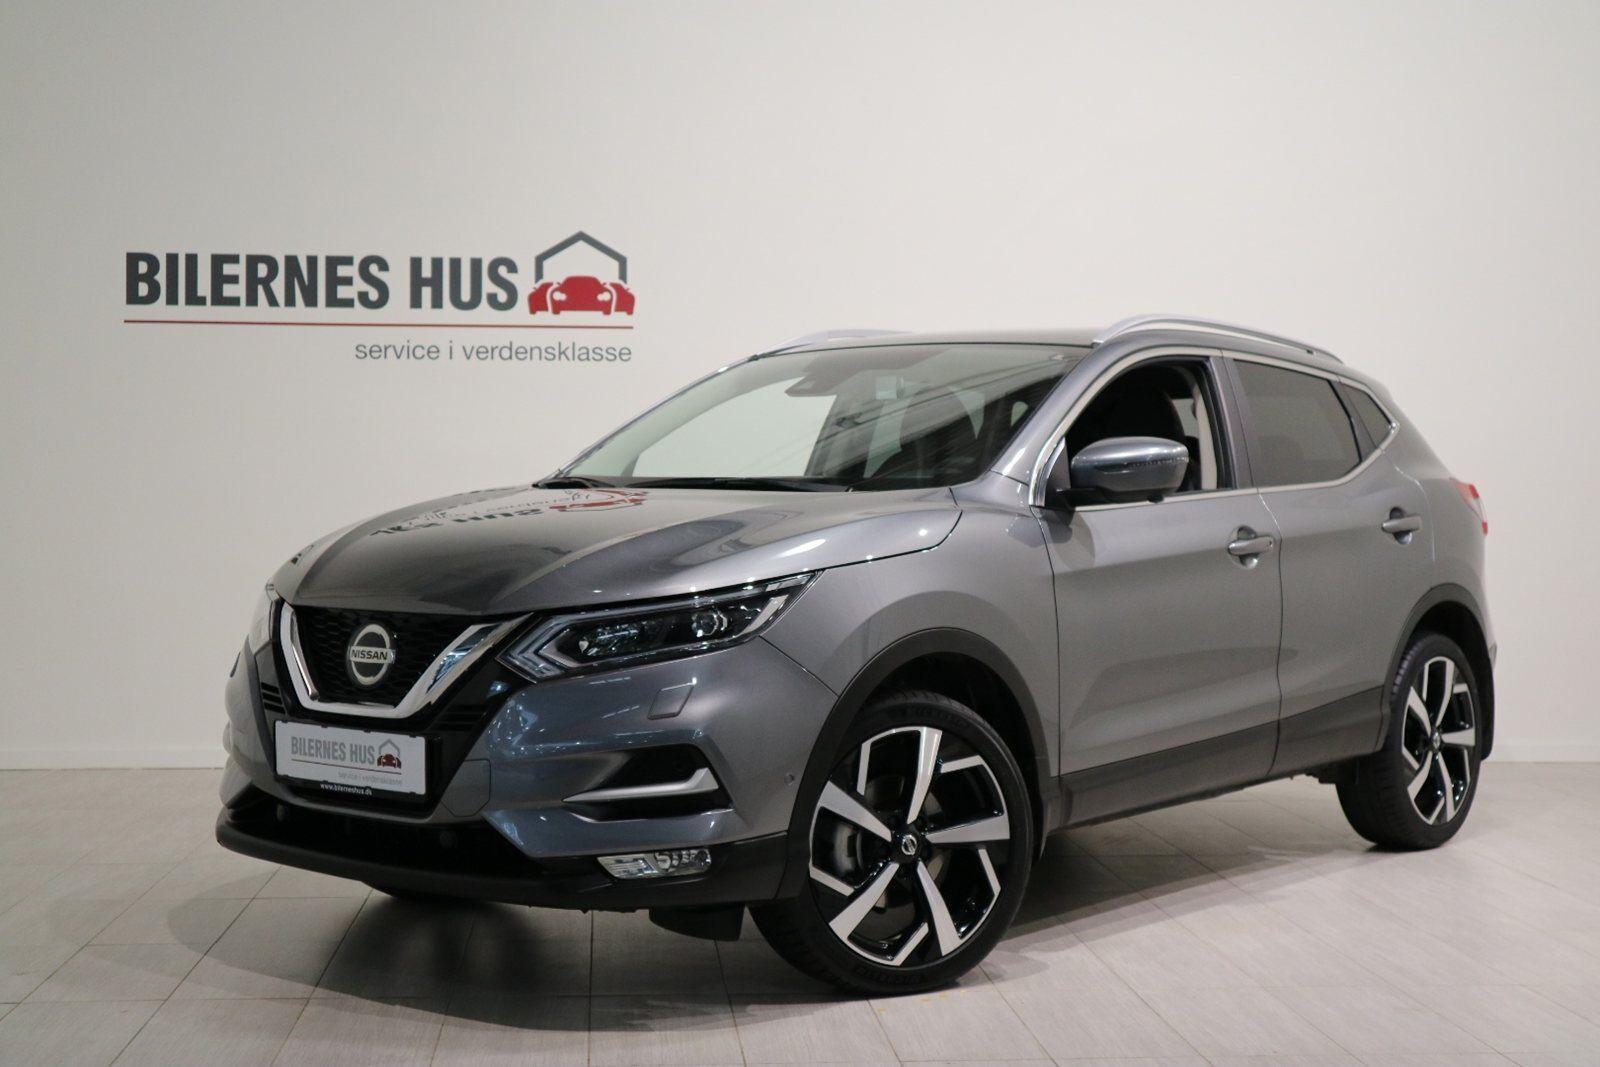 Nissan Qashqai Billede 1